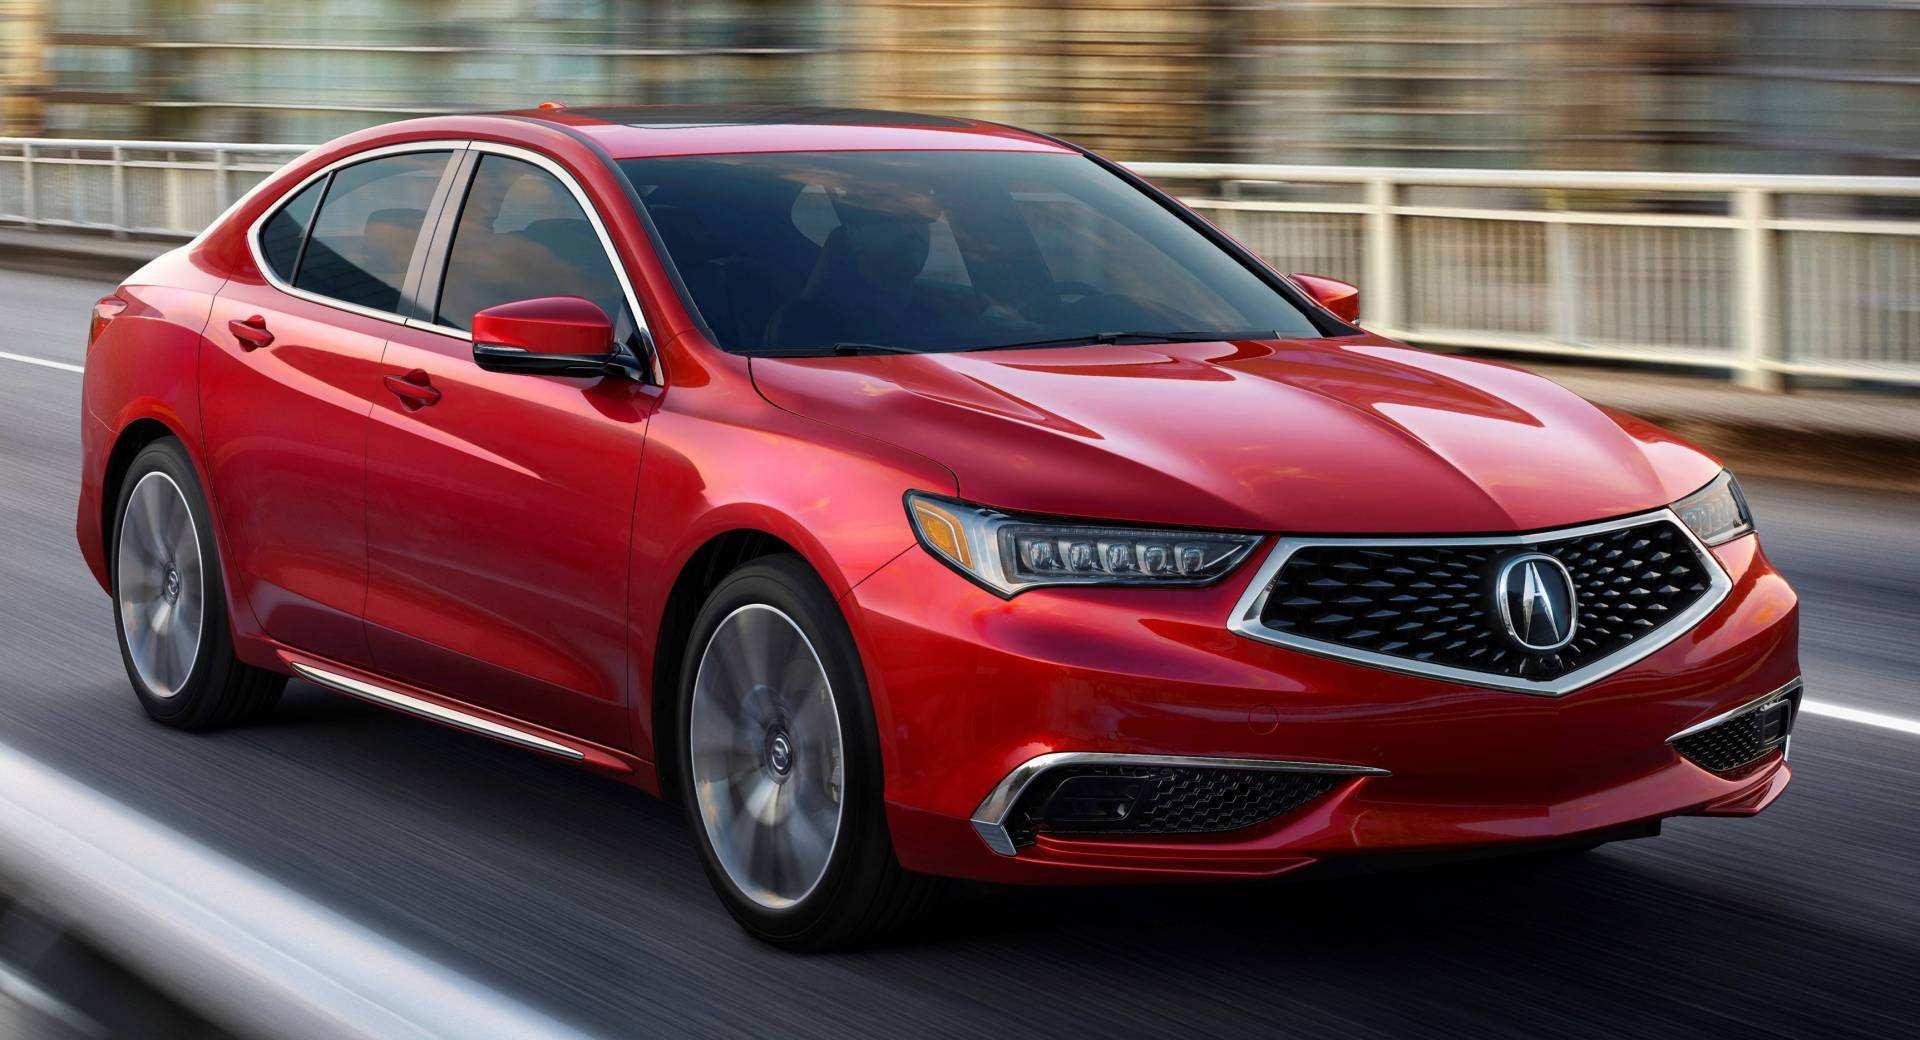 65 Concept of Acura Car 2020 Performance for Acura Car 2020